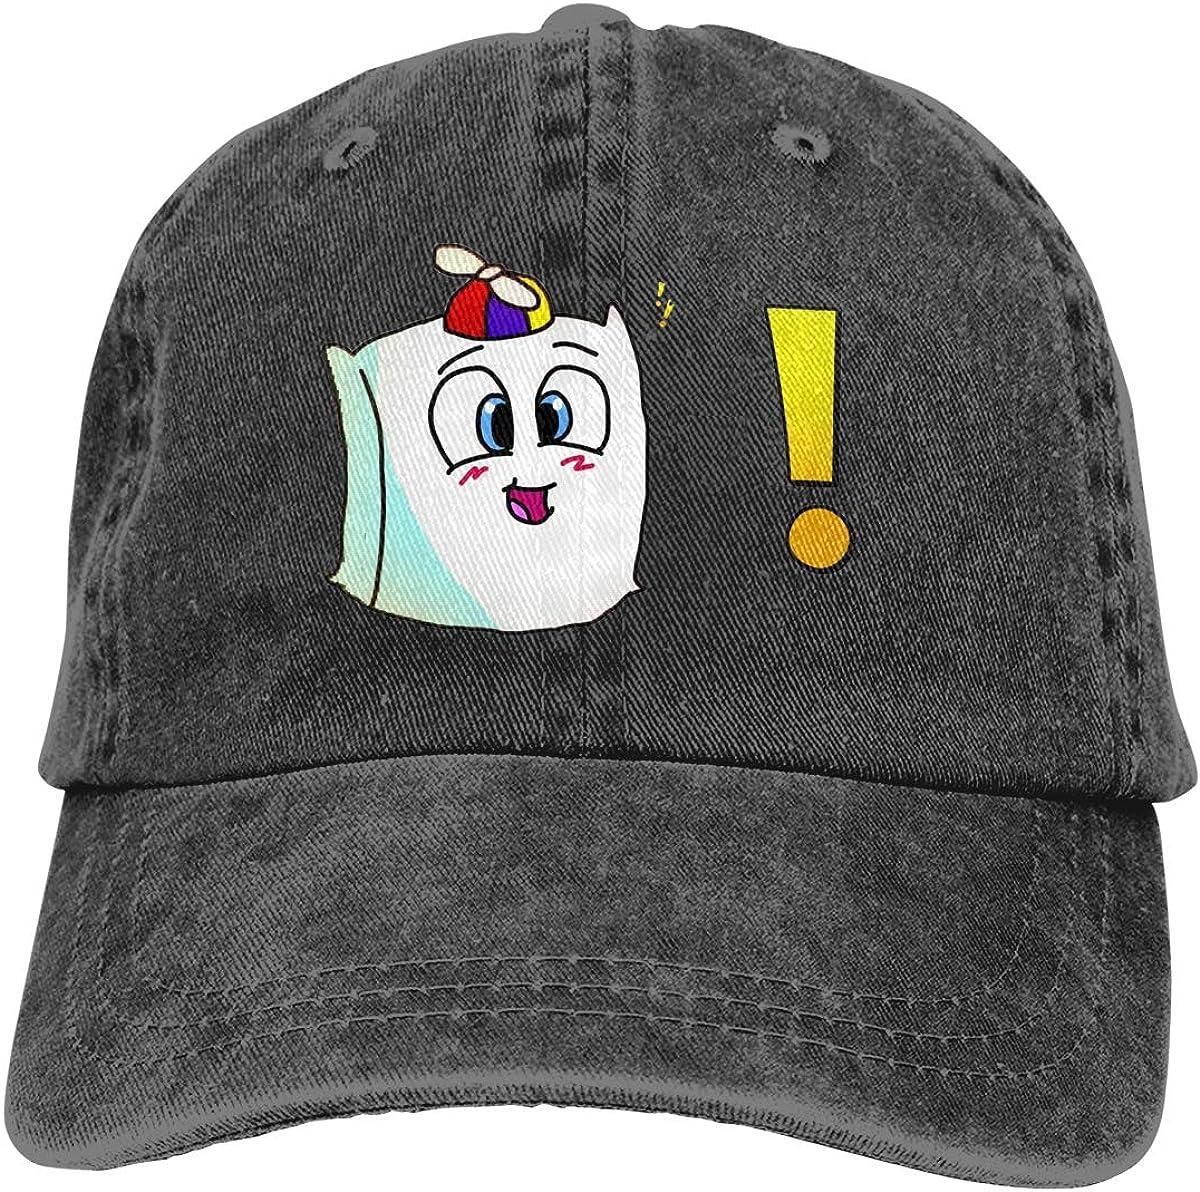 AP.Room Smii7y Adult Cap Adjustable Cowboys Hats Baseball Cap Adjustable Athletic Hat